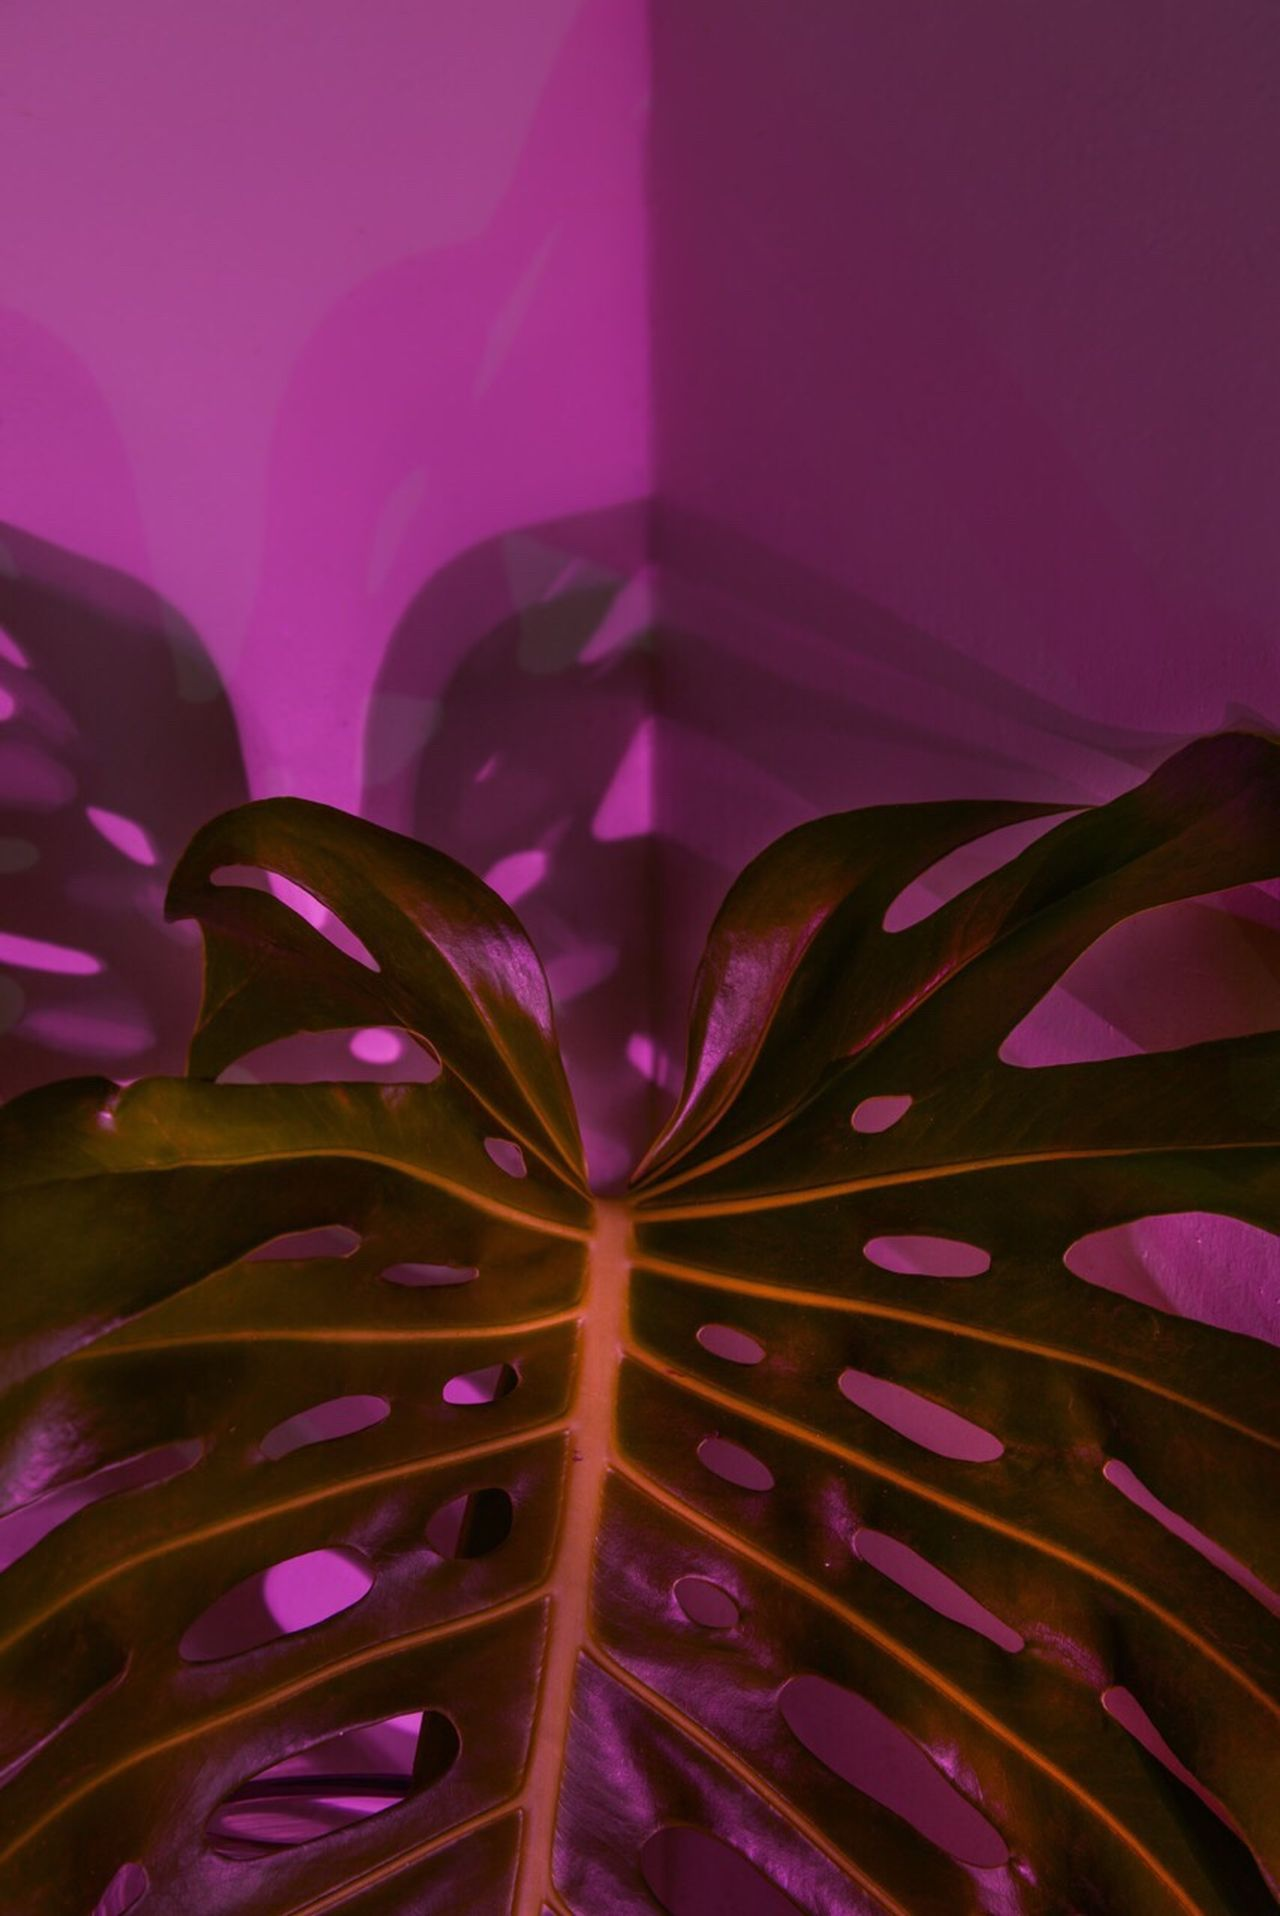 deliciousmonster Plant neon Lifestyle Pink Deliciousmonster Plant Neon Lifestyle Pink